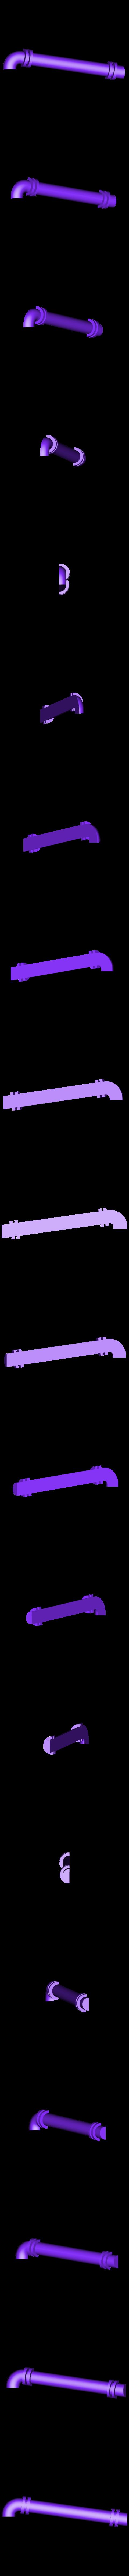 Steam_Pipe_-_Back_Engine-d.STL Download free STL file 4-8-8-4 Big Boy Locomotive • 3D printer object, RaymondDeLuca